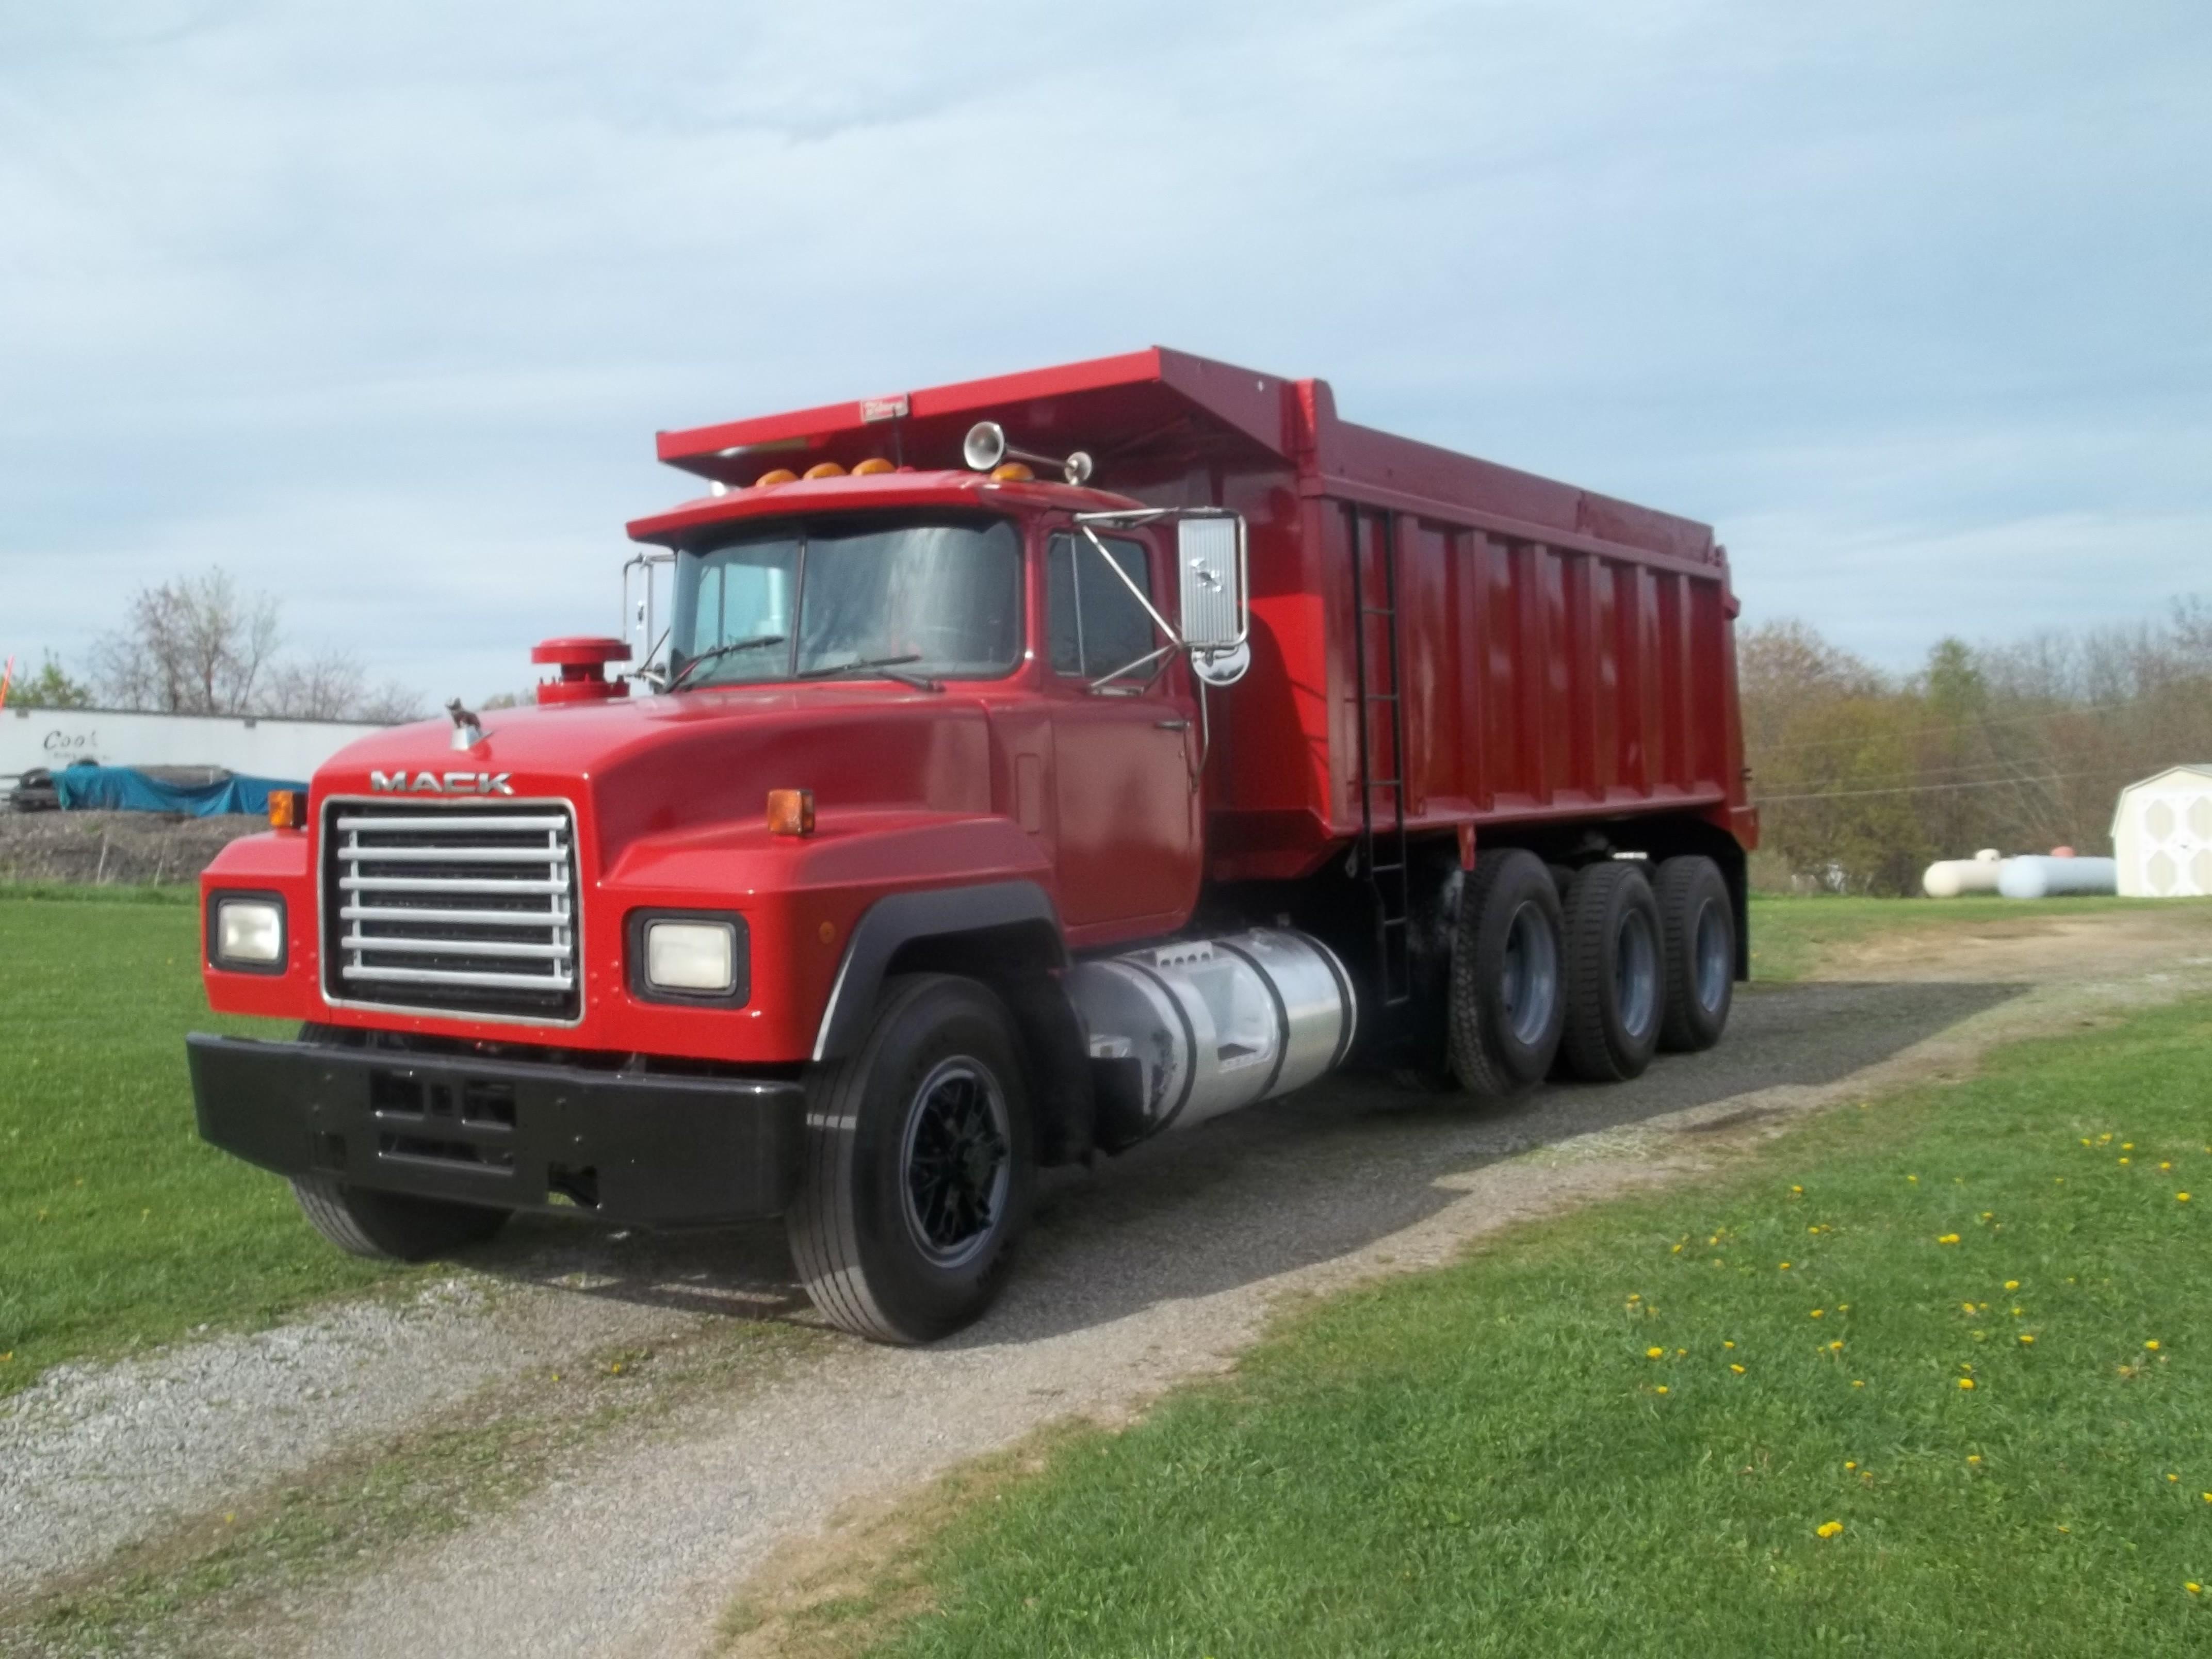 Used, 2000, Mack, RD 688, Dump Trucks